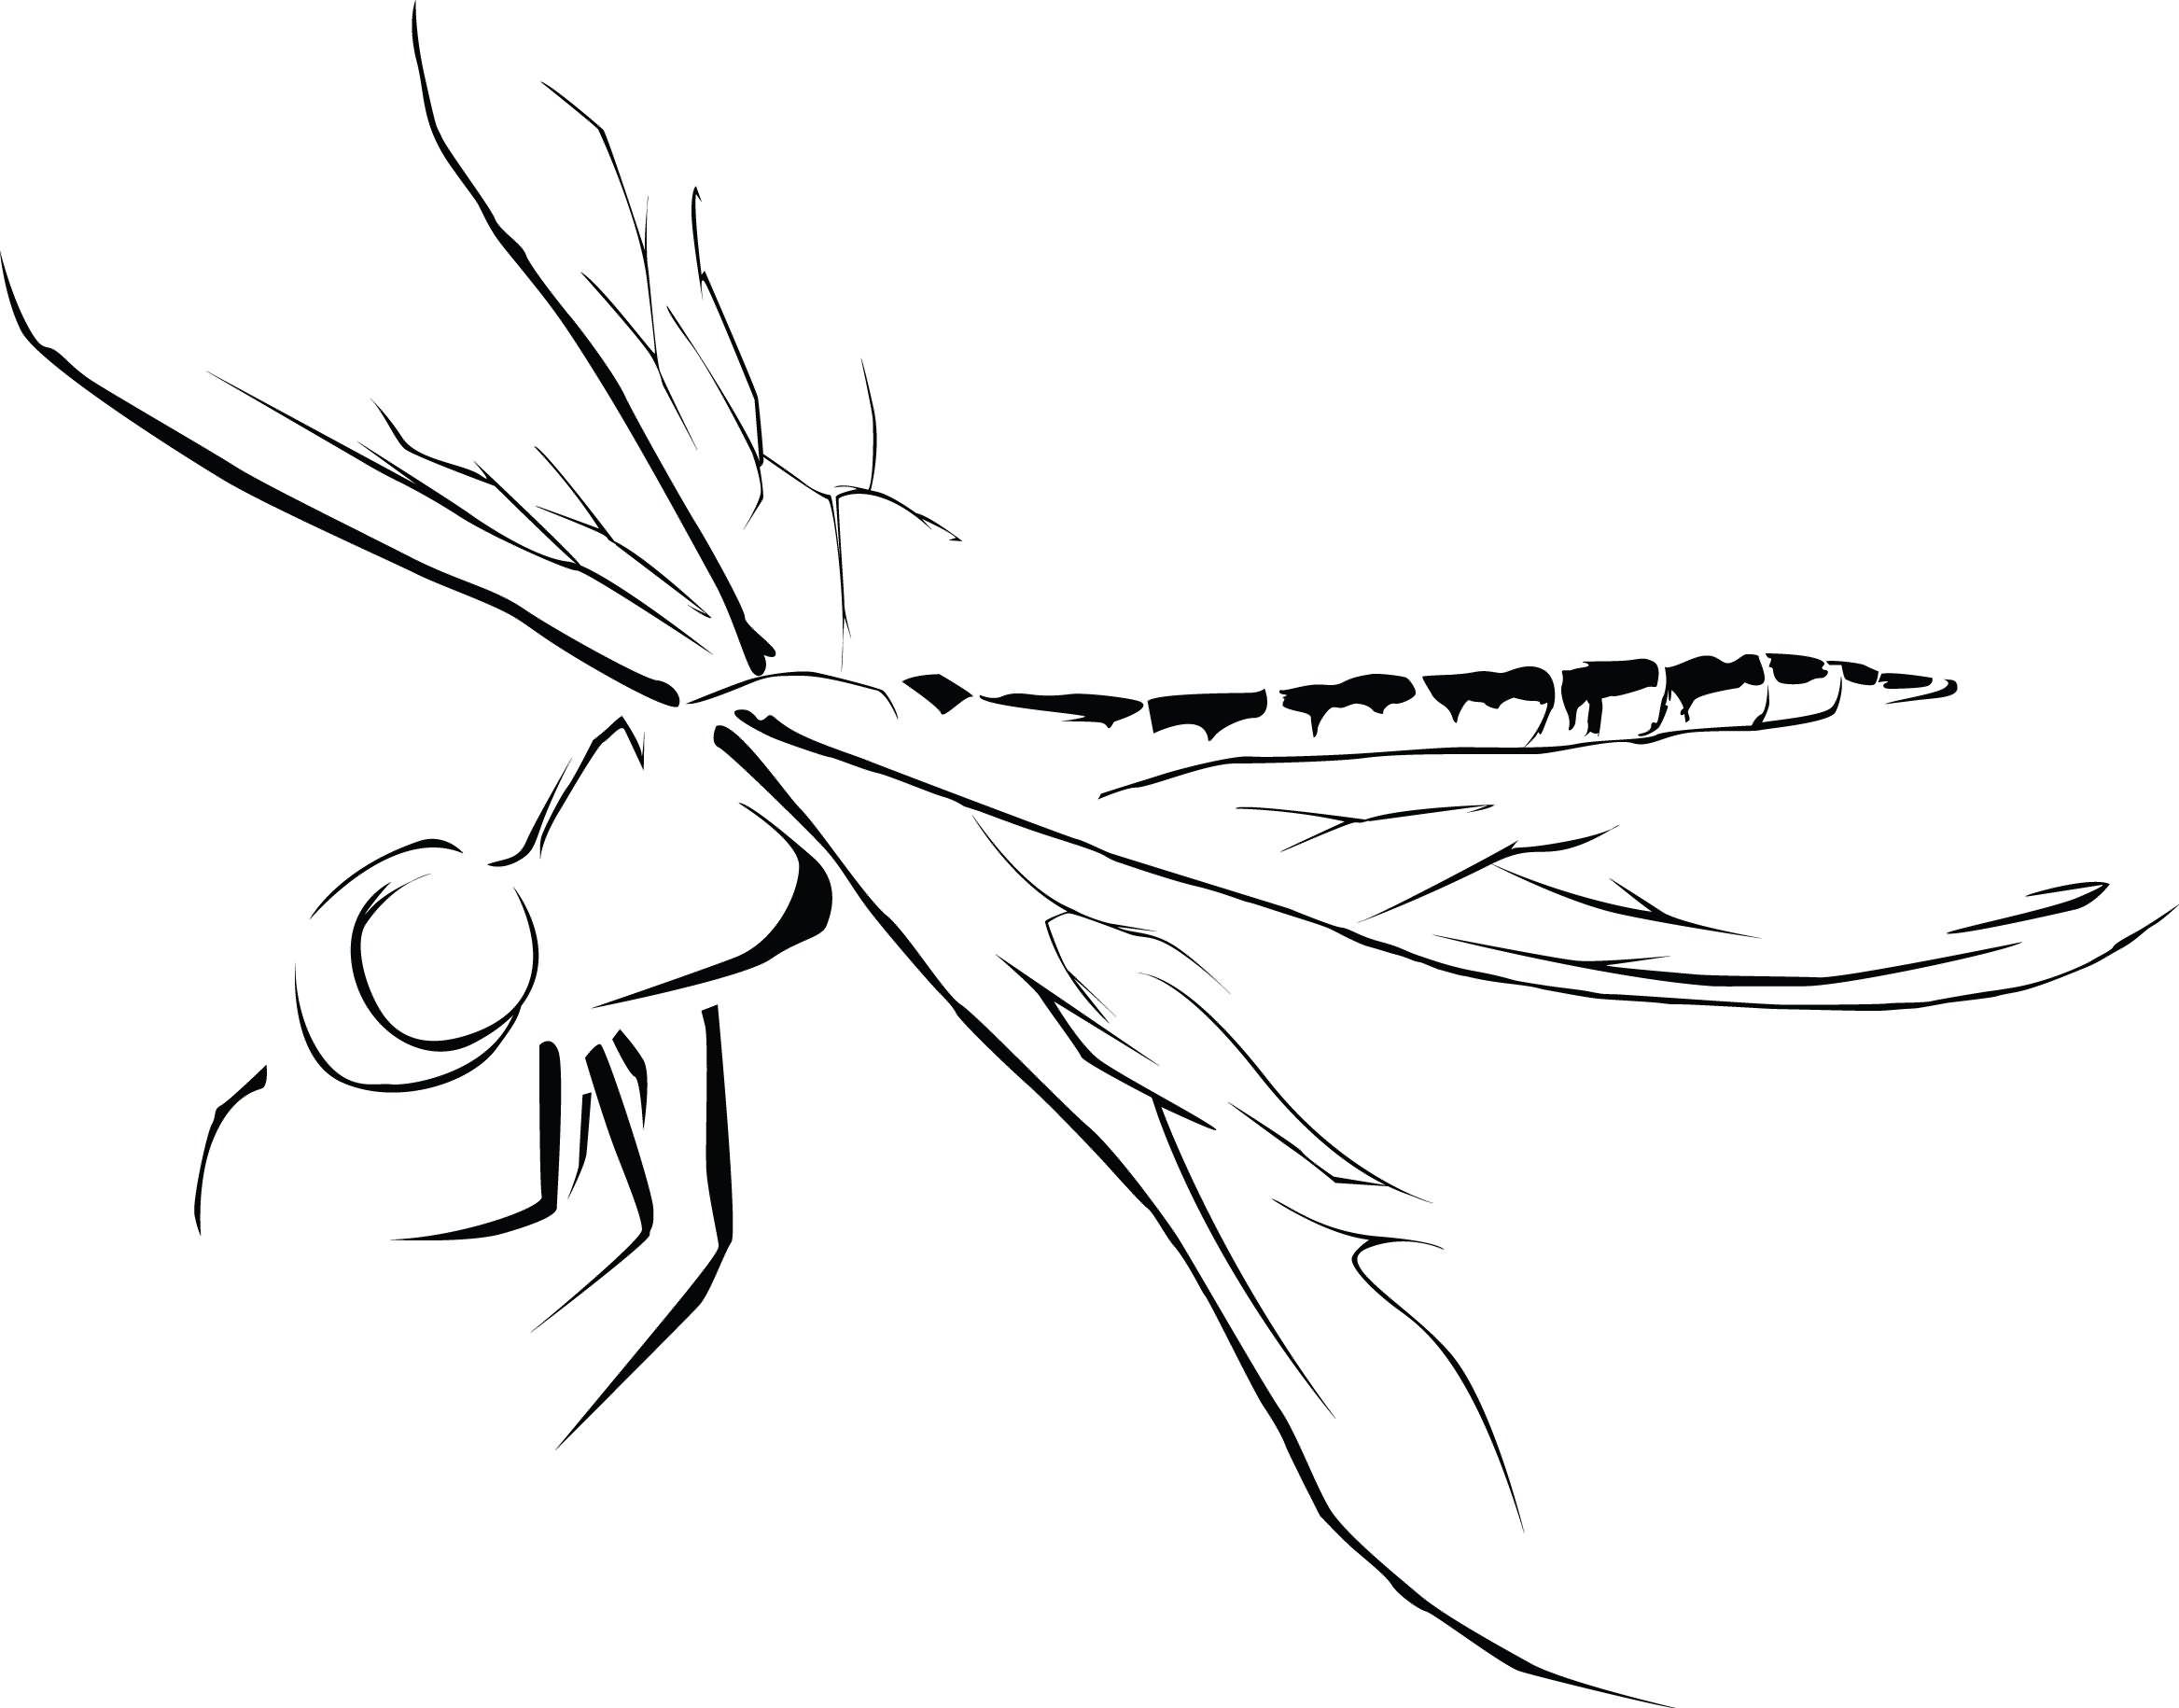 Simple Outline Flying Dragonfly Tattoo Design Tattooimages Biz